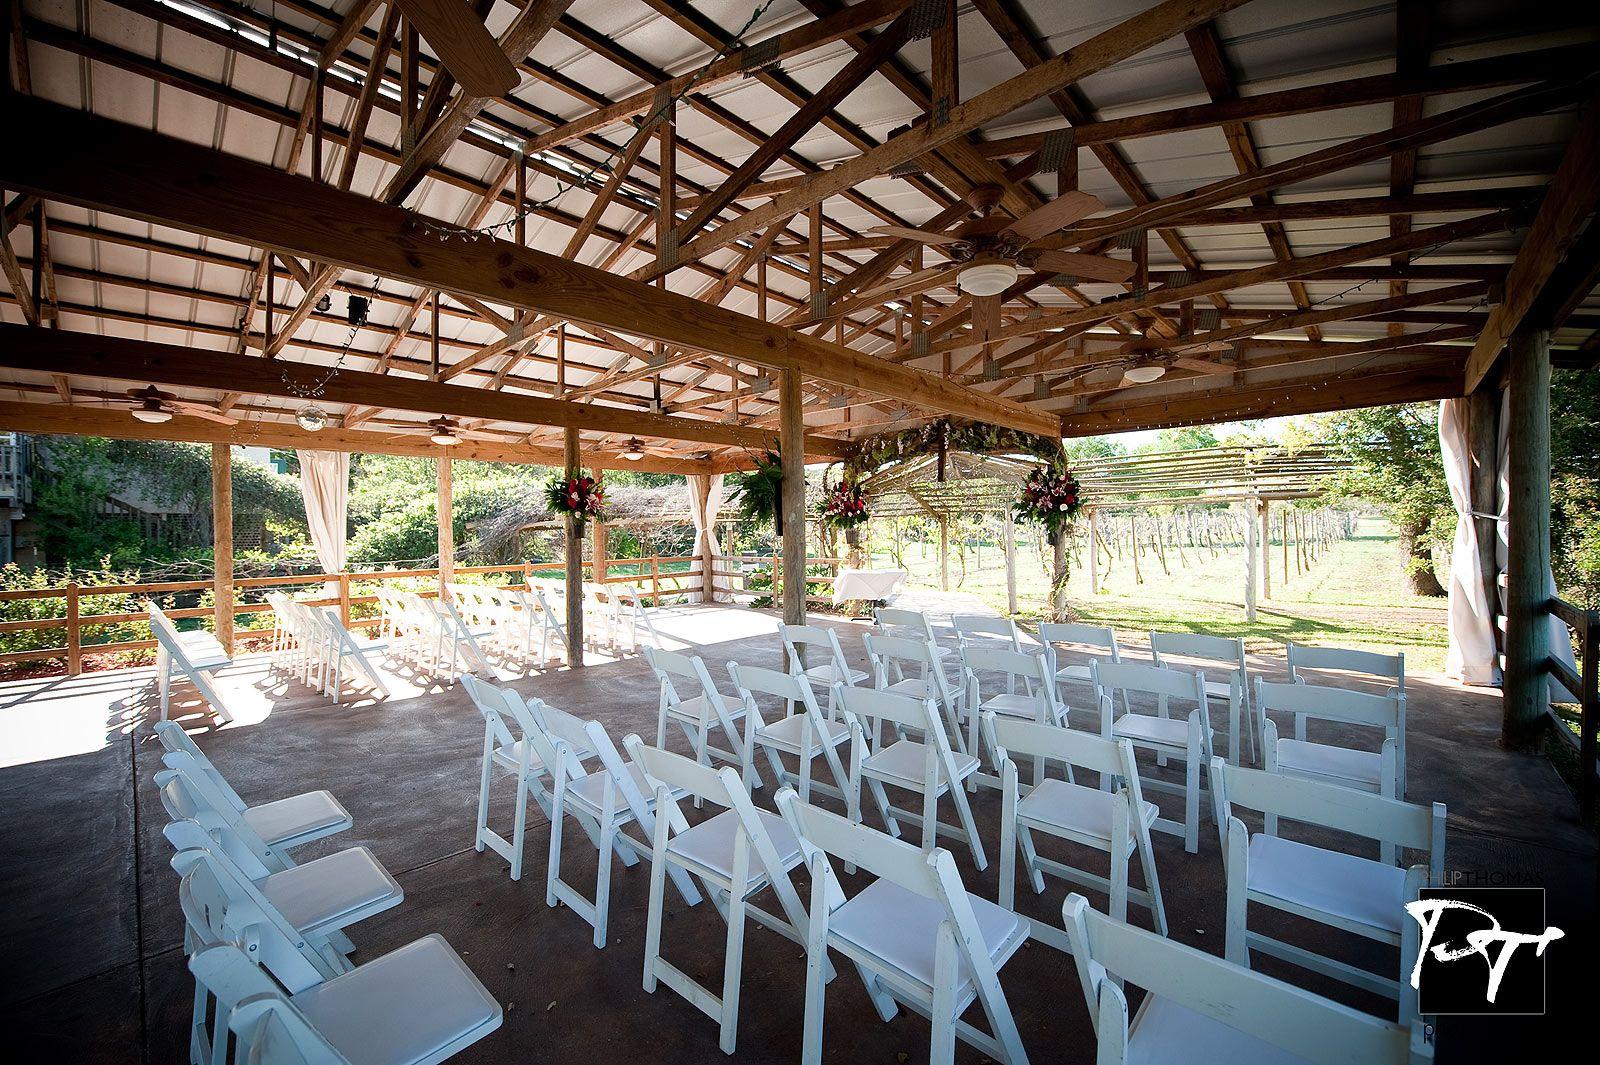 Gallery The Vineyards At Garden Ridge Restaurant And